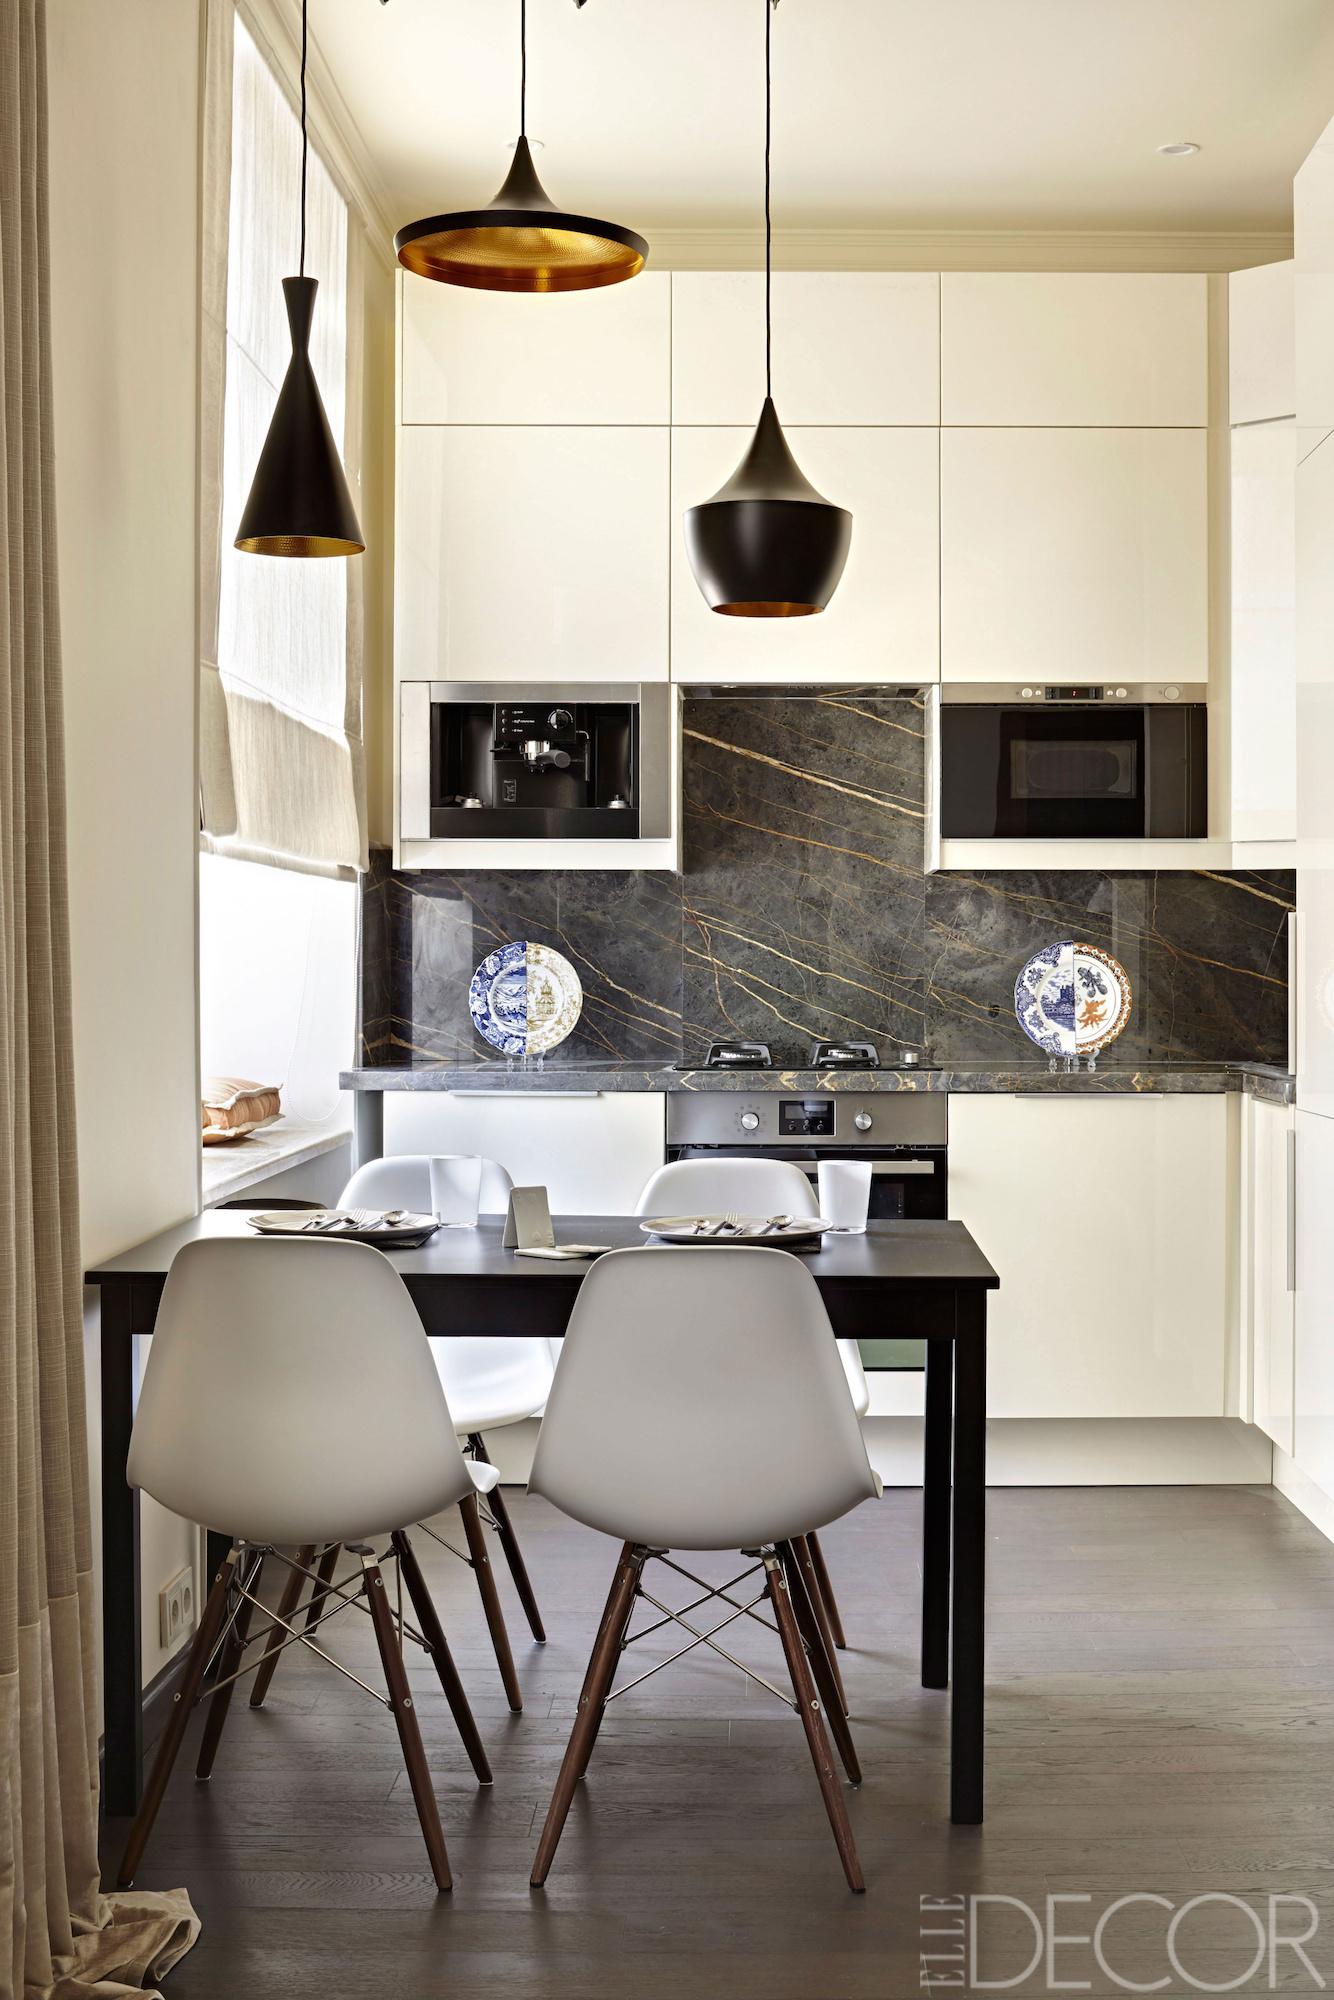 small kitchens 40 small kitchen design ideas - decorating tiny kitchens EBTKYPK